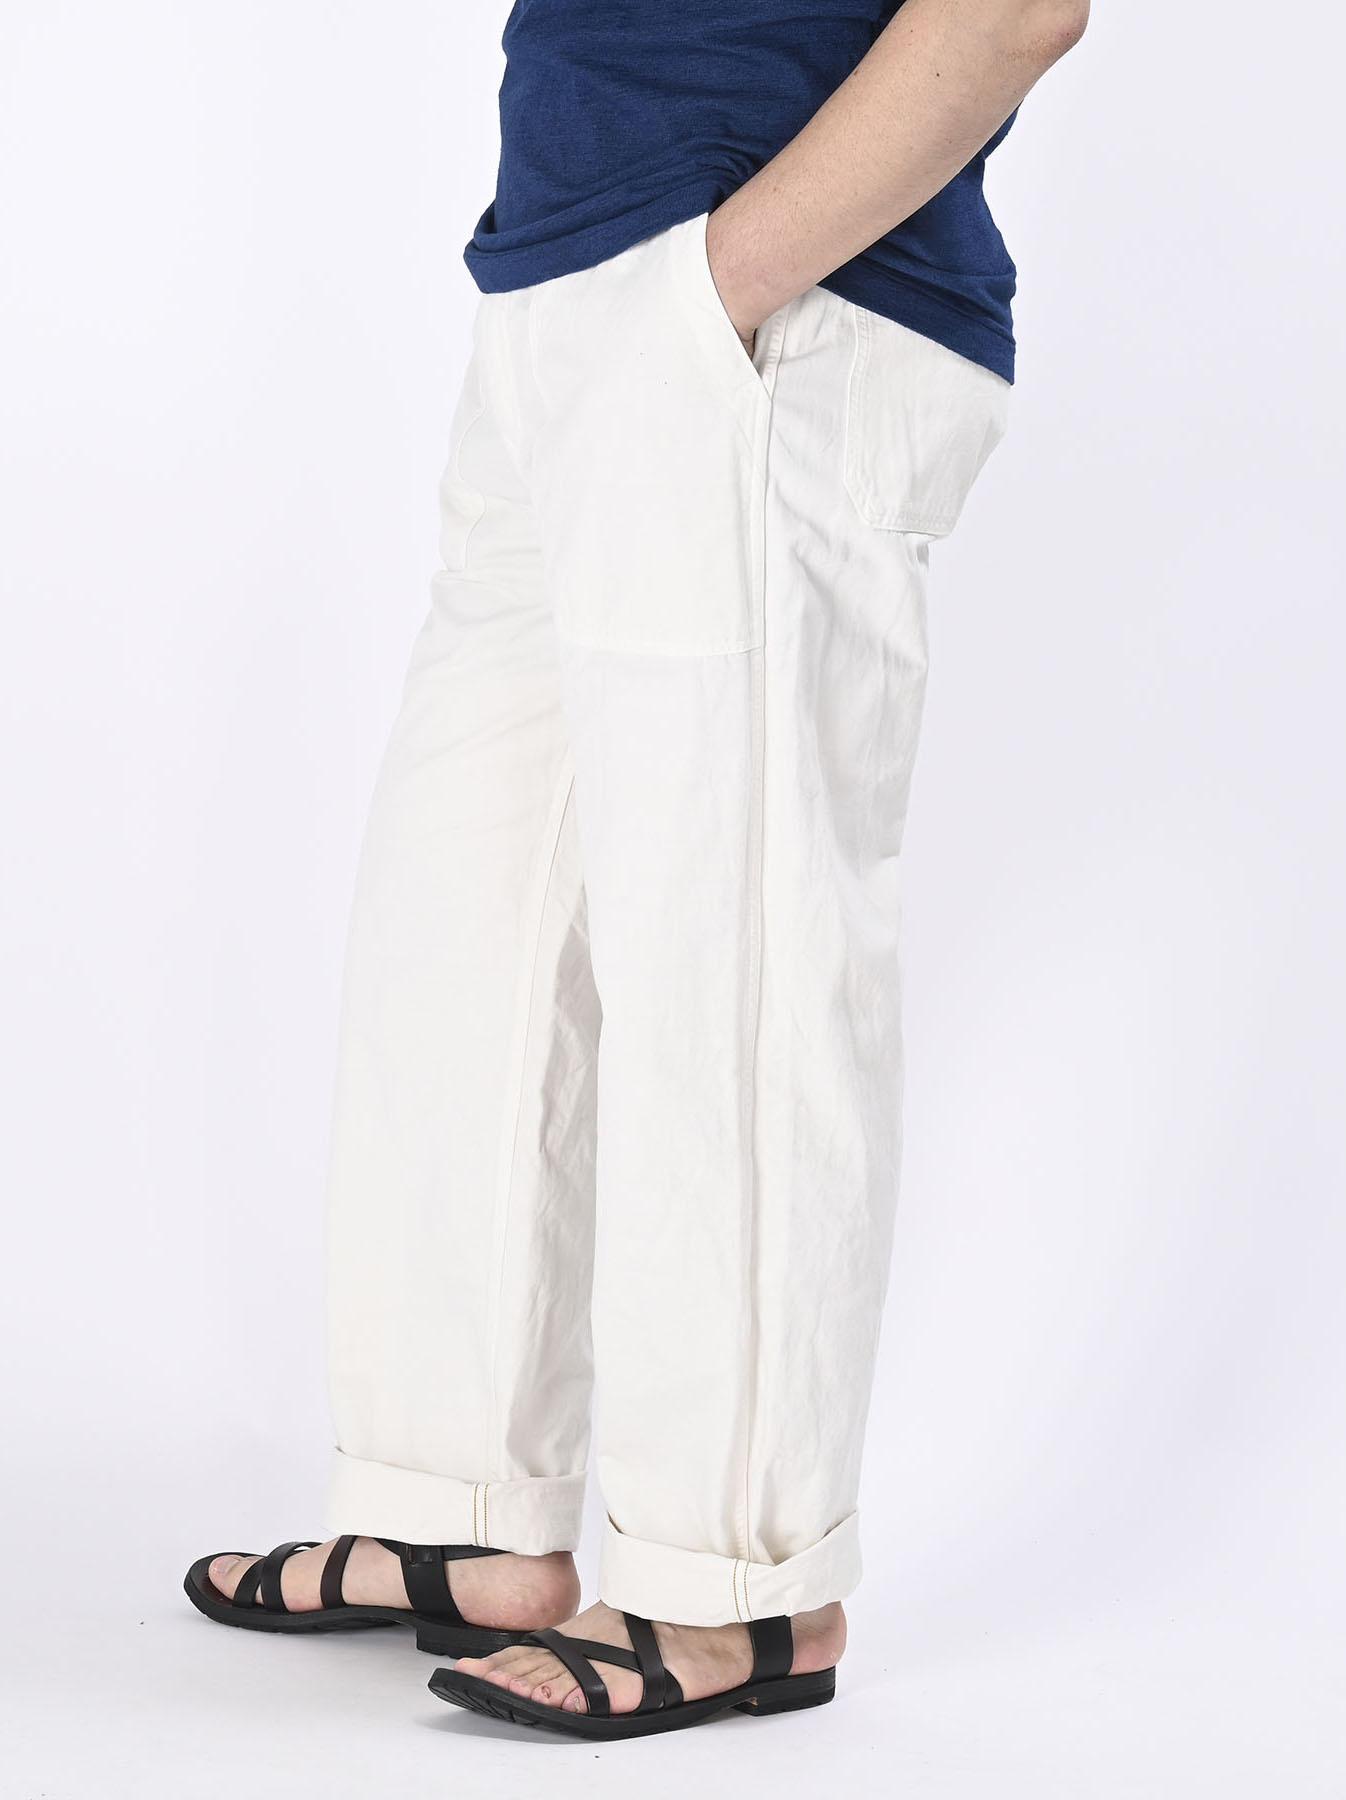 Yacht Cotton White 908 Baker Pants (0521)-9